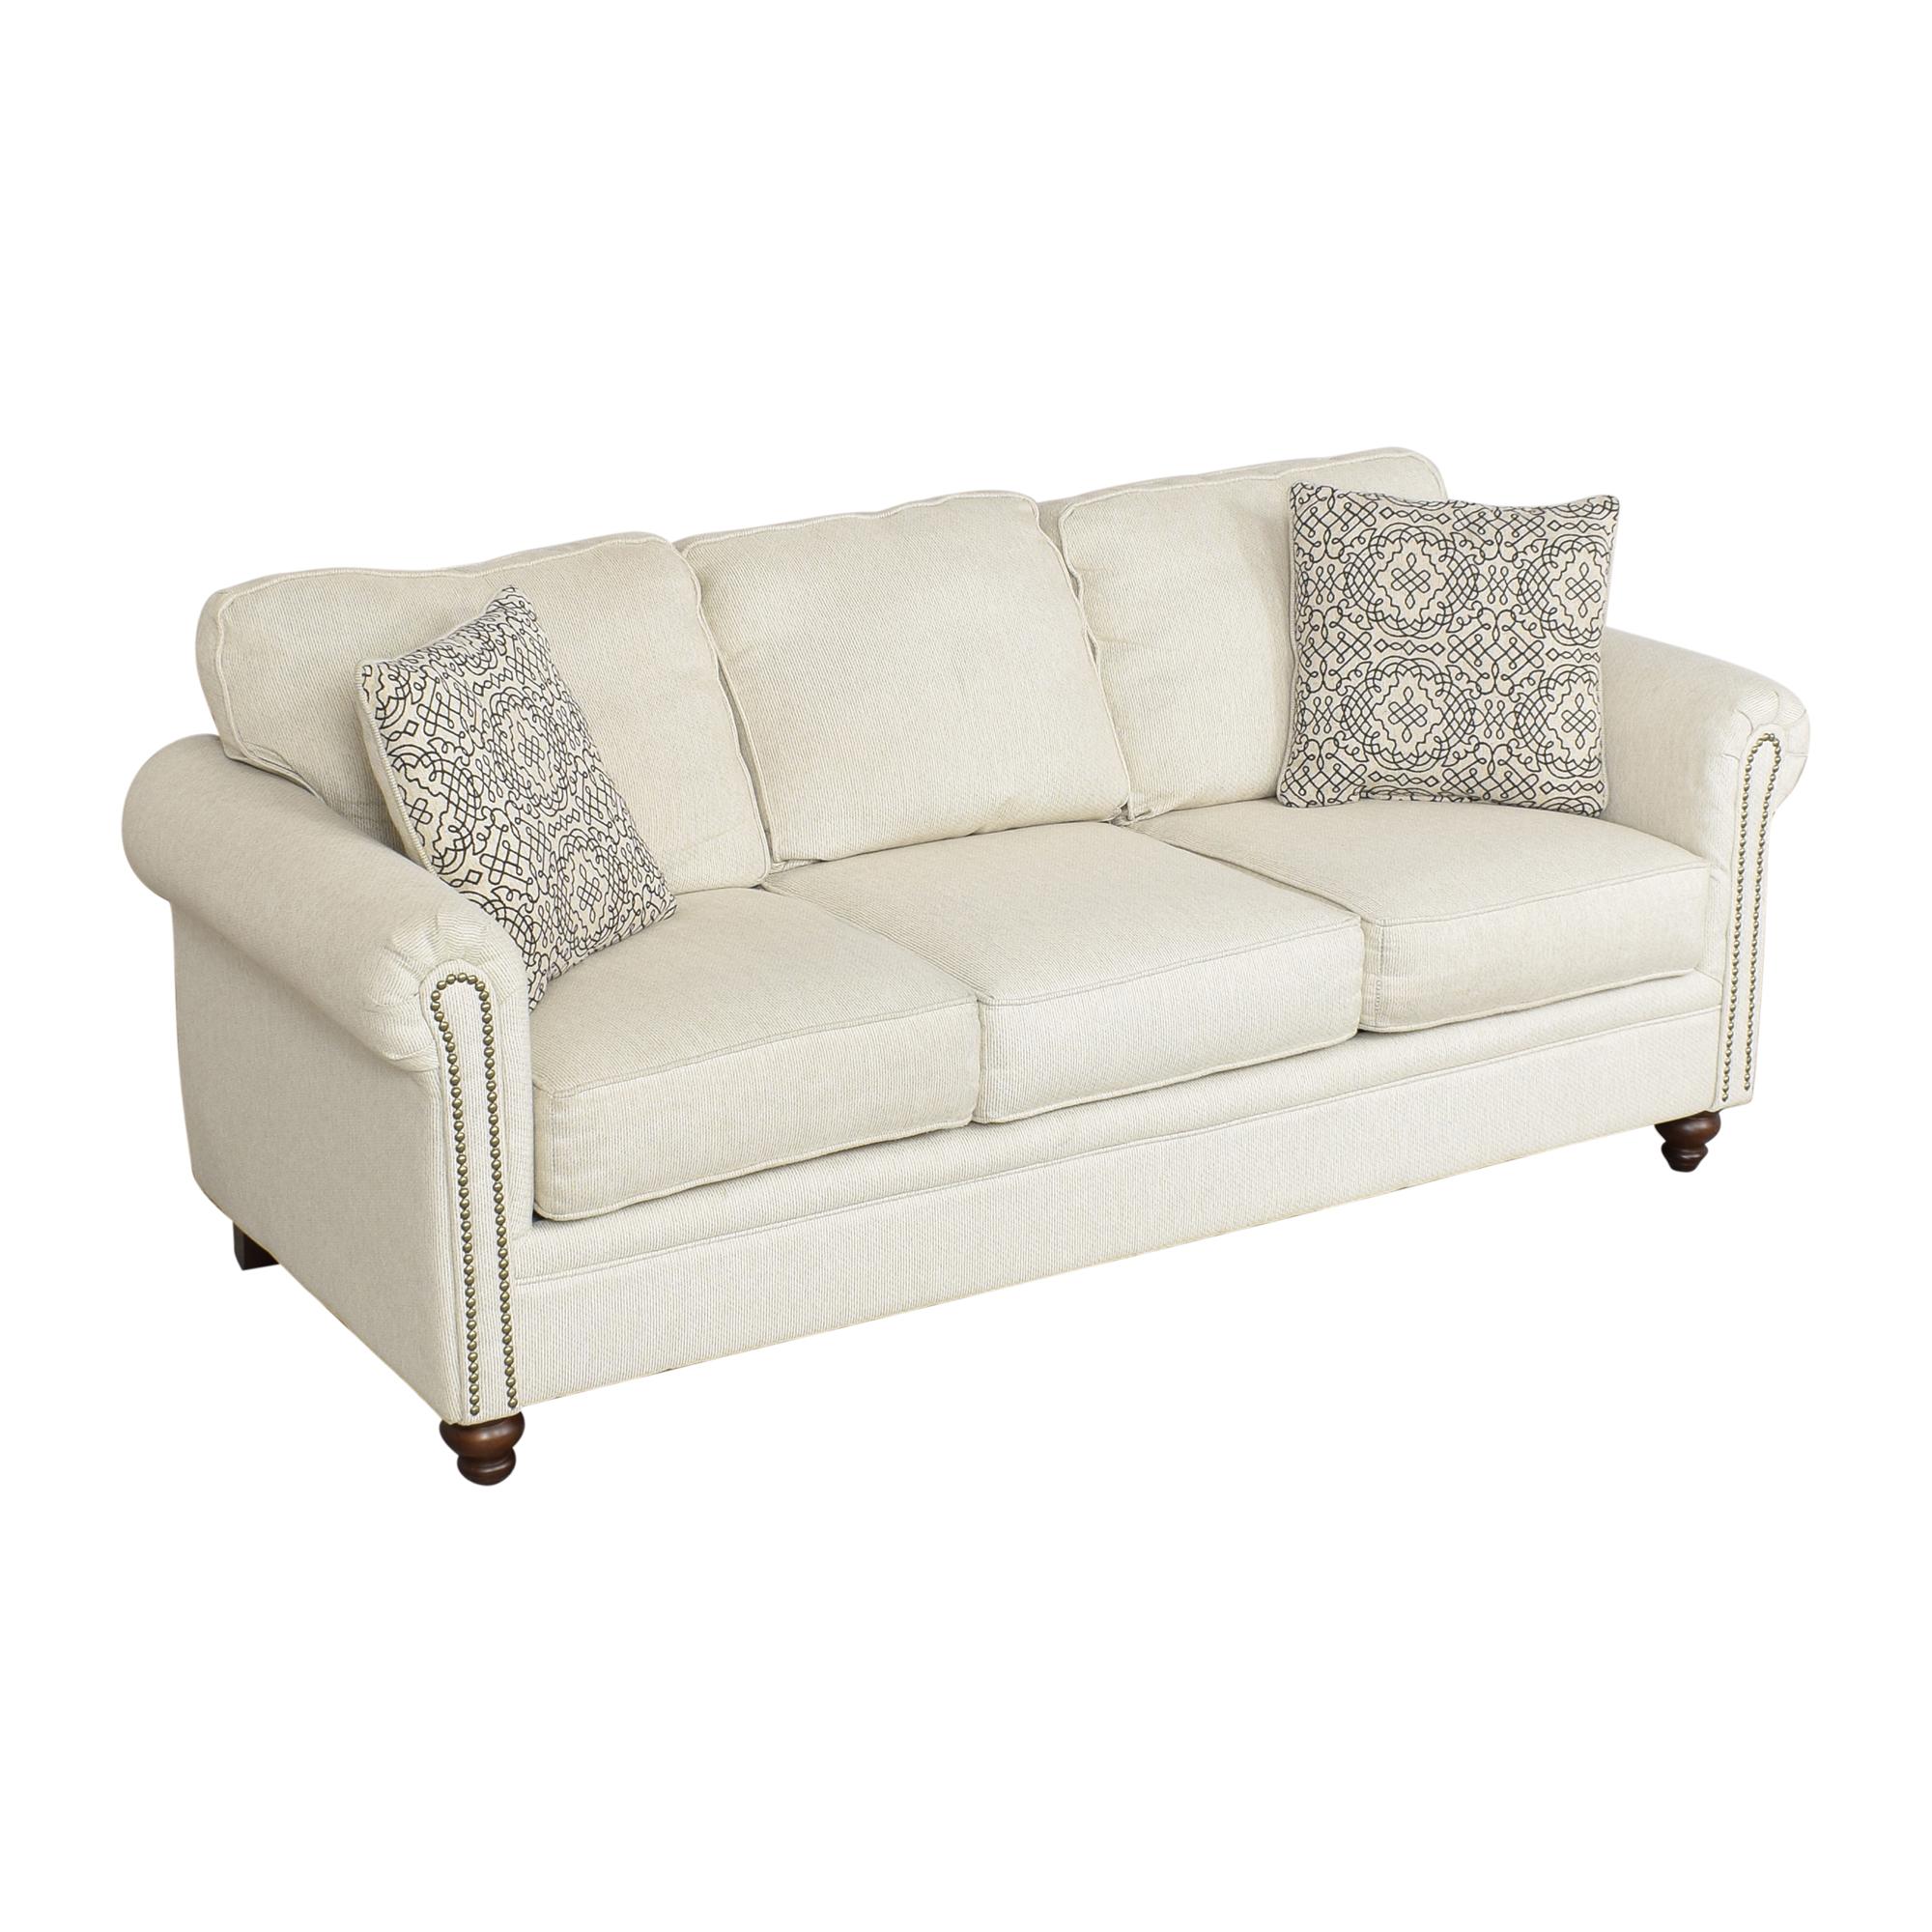 buy Hughes Furniture Hughes Furniture Roll Arm Nailhead Sofa online